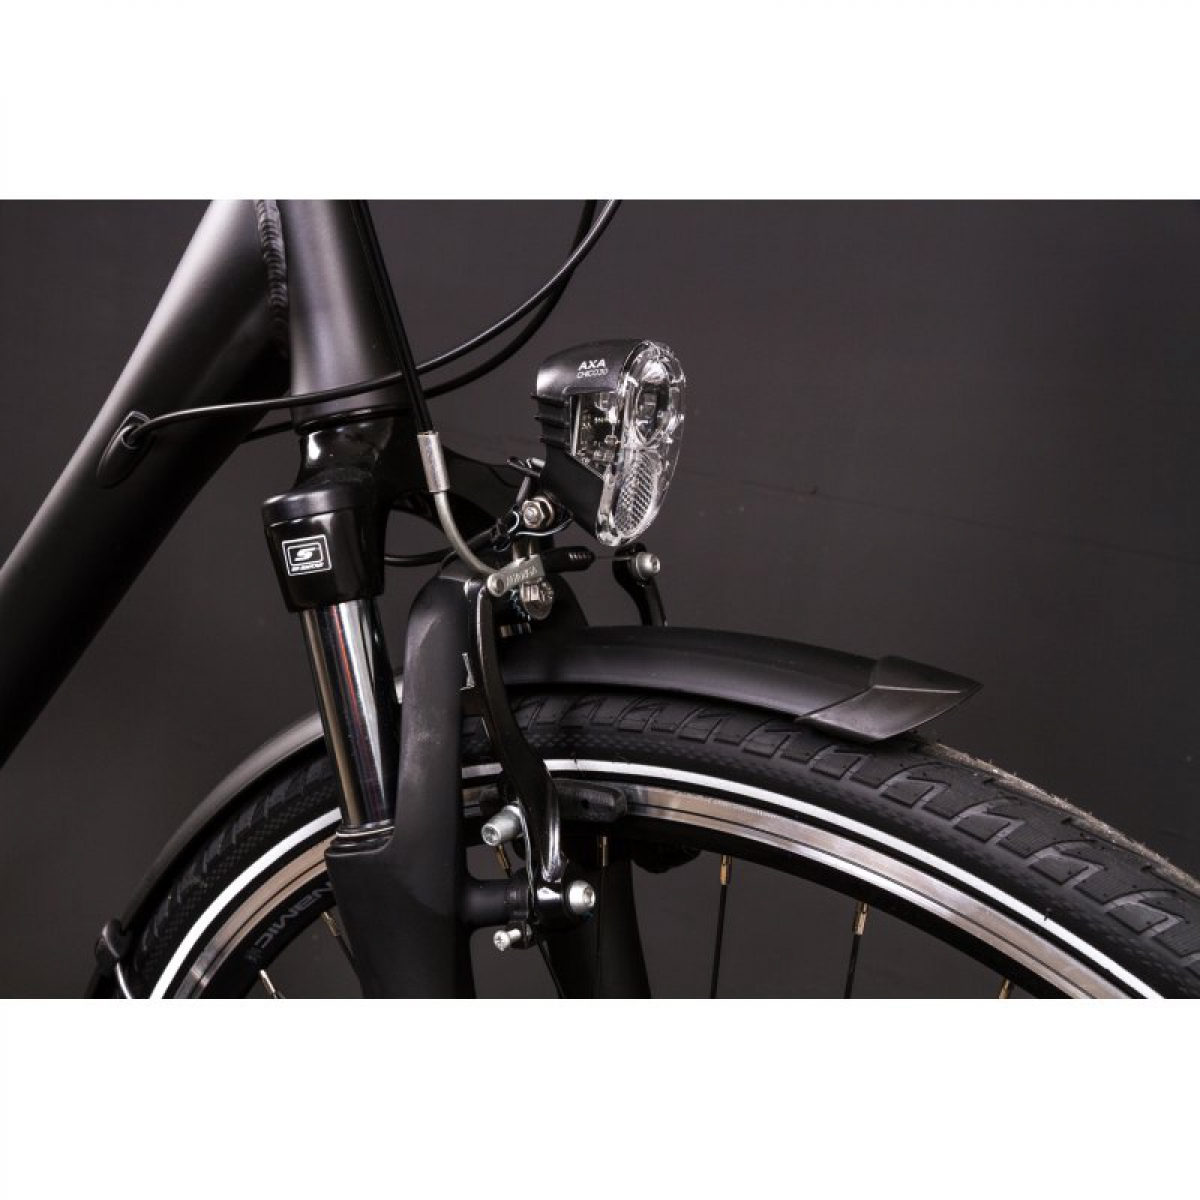 28 zoll alu herren bike trekking fahrrad shimano 24 gang nabendynamo continental schwarz rh 55. Black Bedroom Furniture Sets. Home Design Ideas